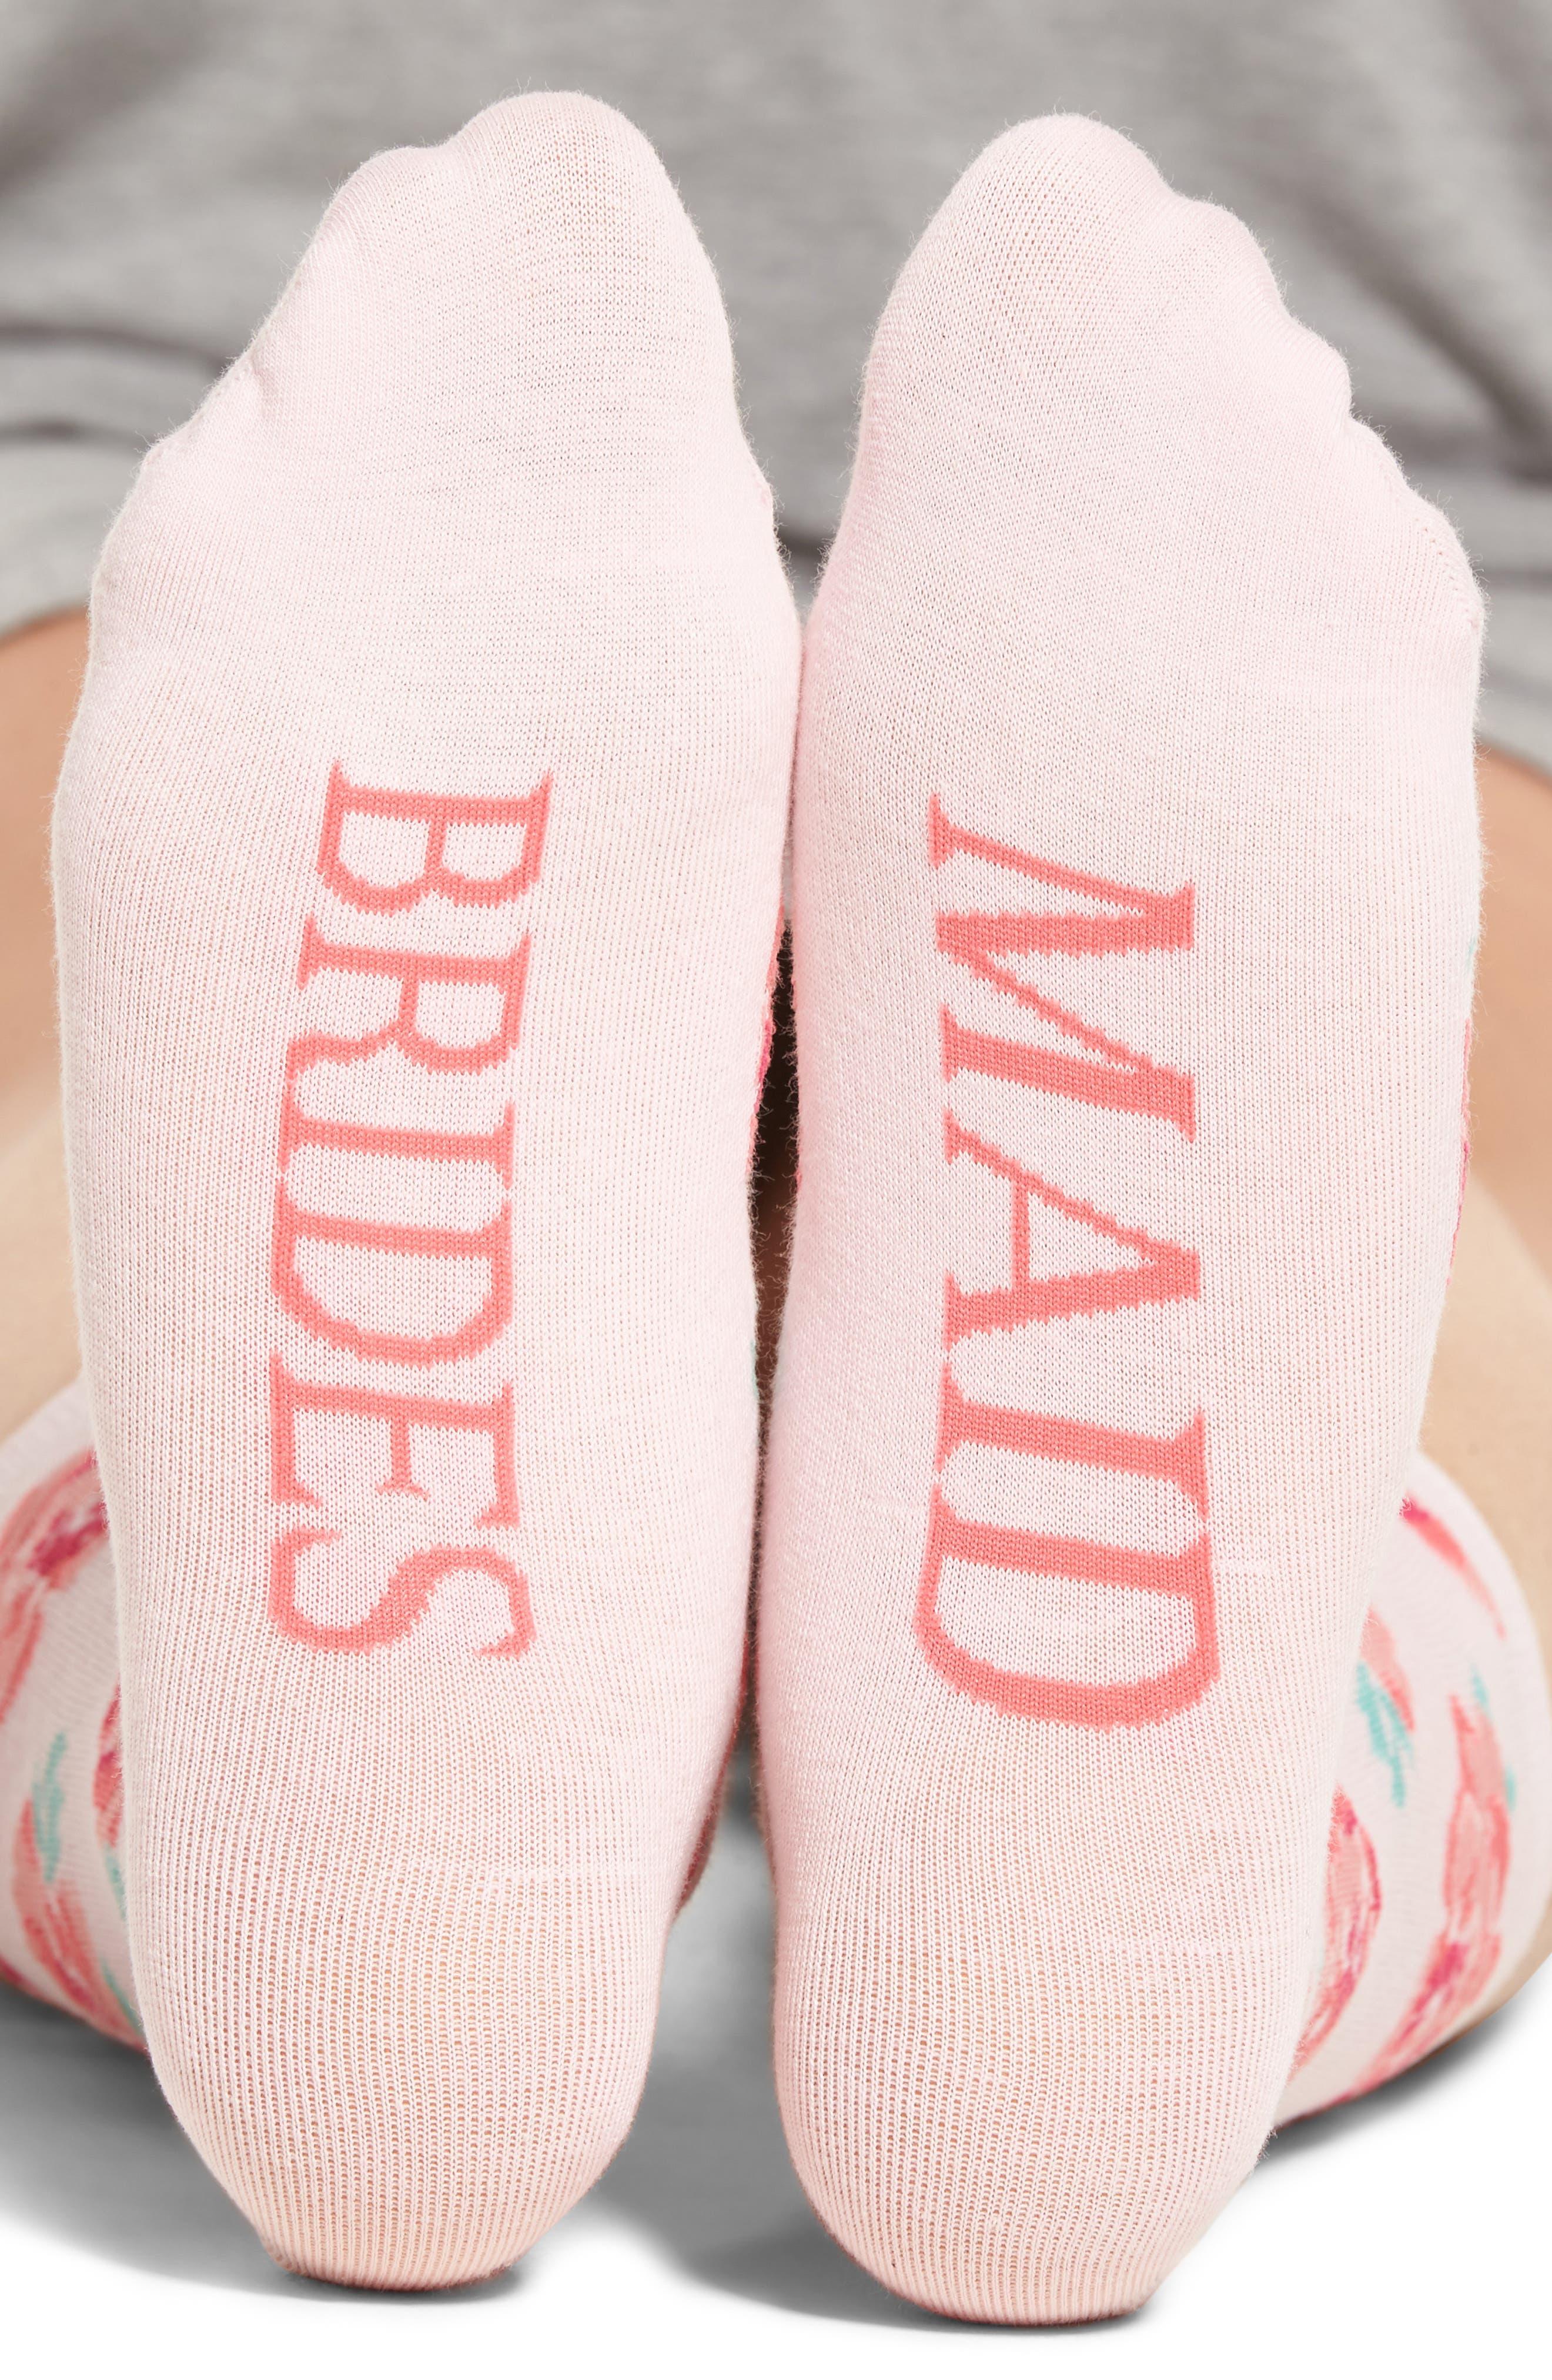 Alternate Image 1 Selected - SOCKART Bridesmaid Crew Socks